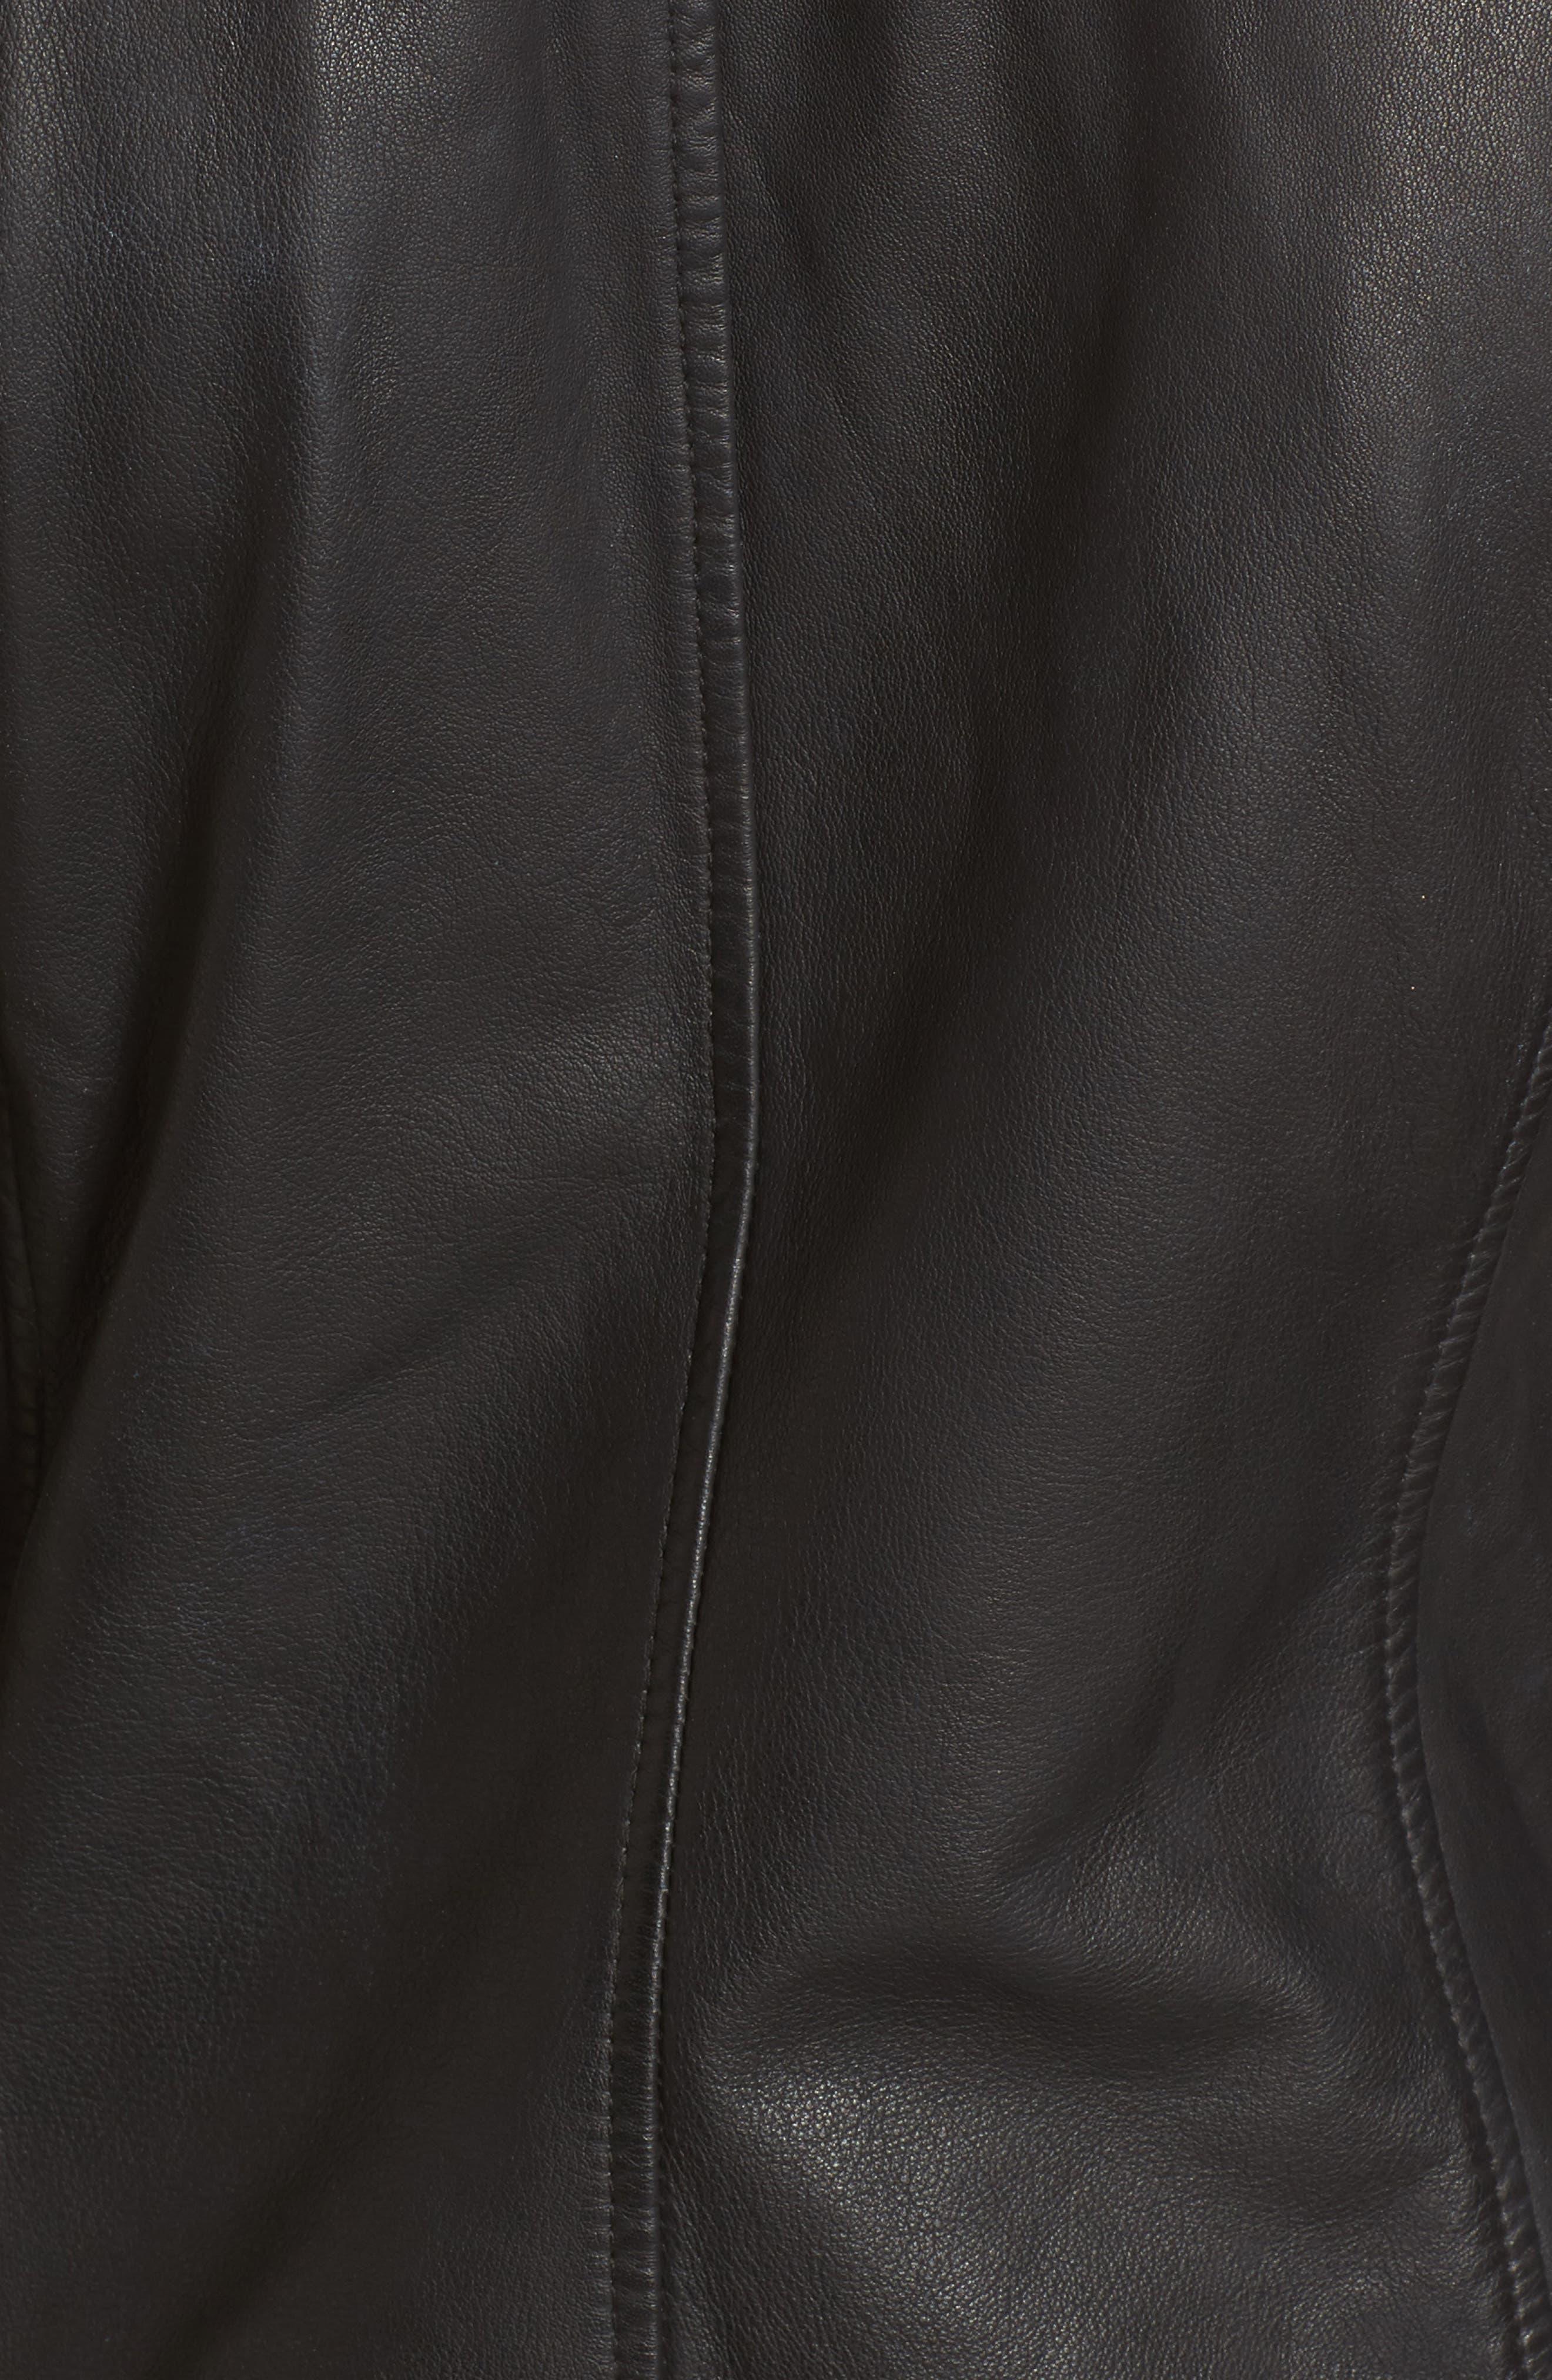 Moto Zip Leather Jacket,                             Alternate thumbnail 11, color,